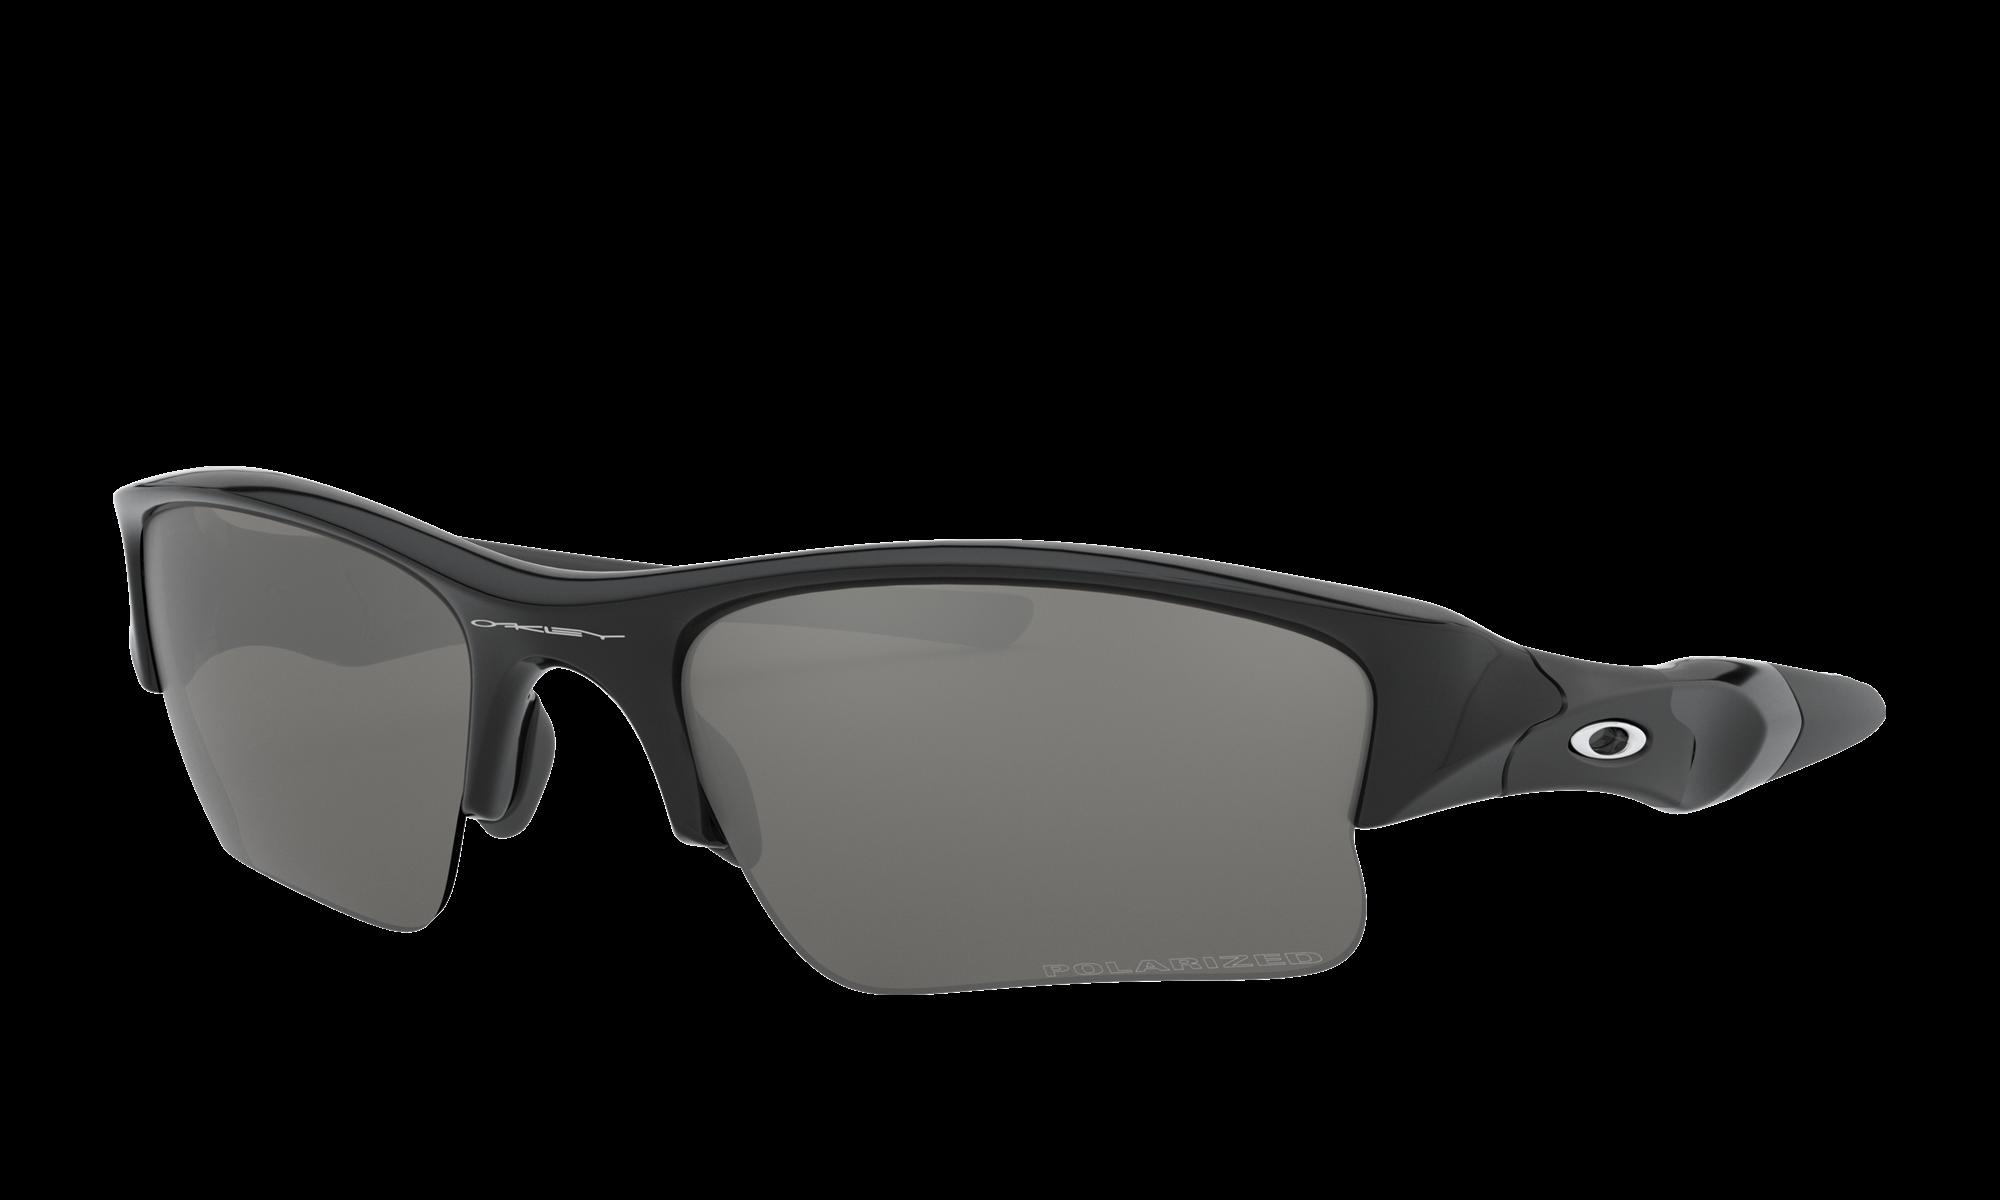 Oakley FLAK JACKET XLJ Black Sunglasses | Glasses.com ...